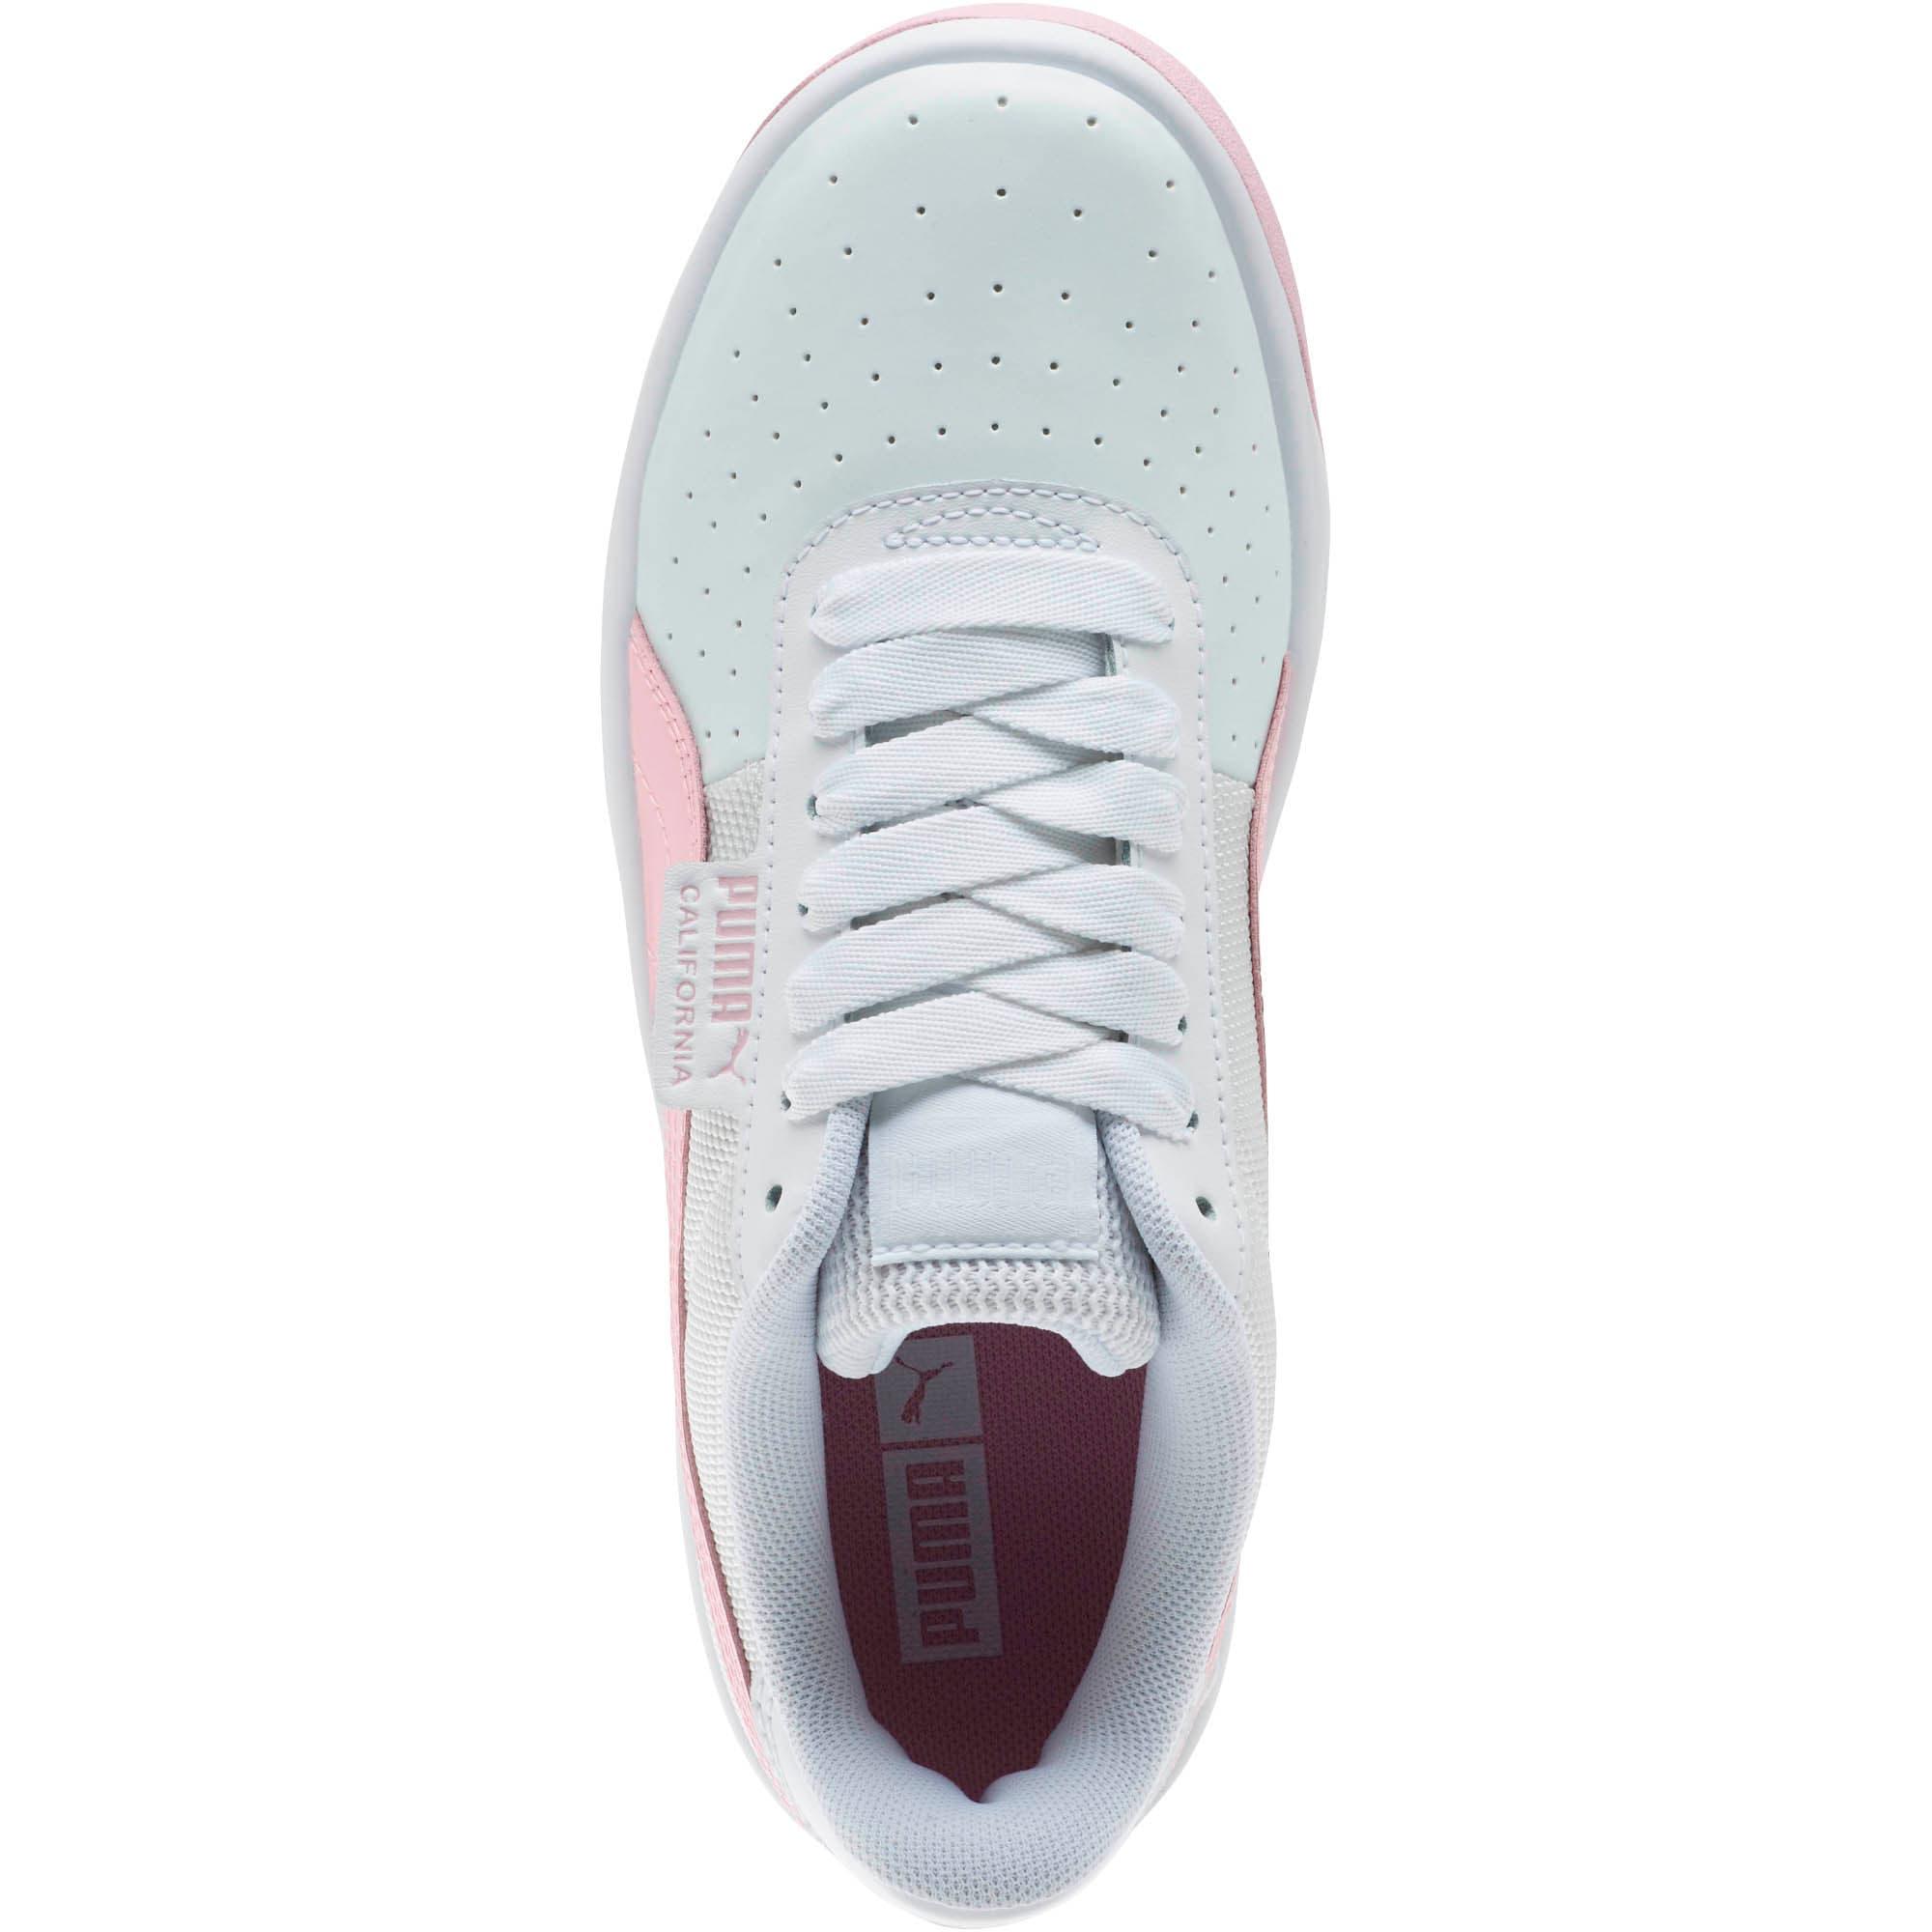 Thumbnail 5 of California Sneakers JR, Puma Wht-Pale Pink-Puma Wht, medium